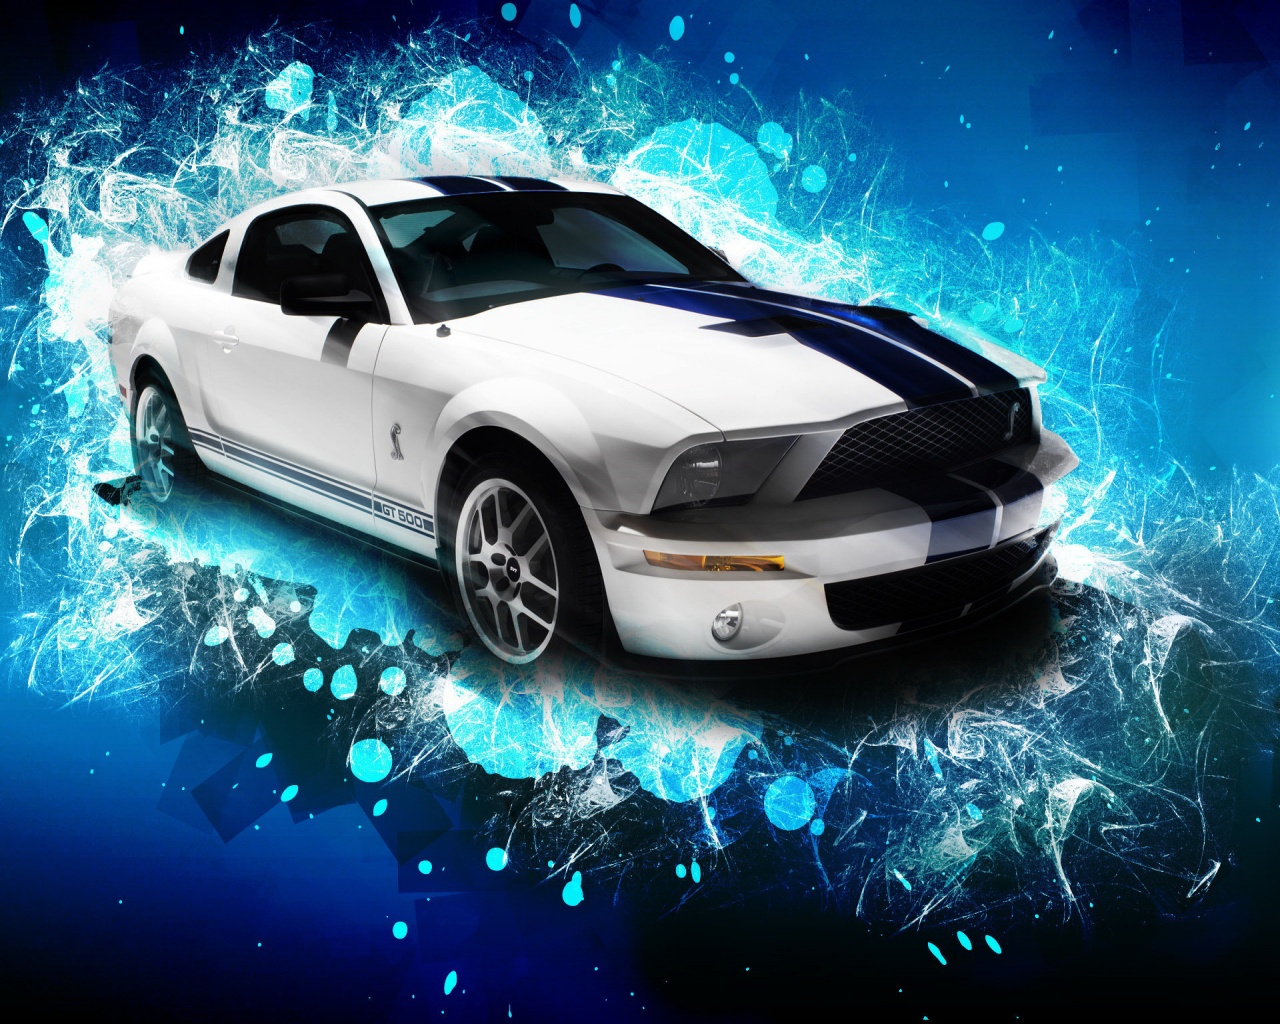 http://1.bp.blogspot.com/-TYivIxpMNKQ/TwBKMYB-VdI/AAAAAAAAB_k/vHTC93PieUE/s1600/carros_tunados_games-carros+%252811%2529.jpg